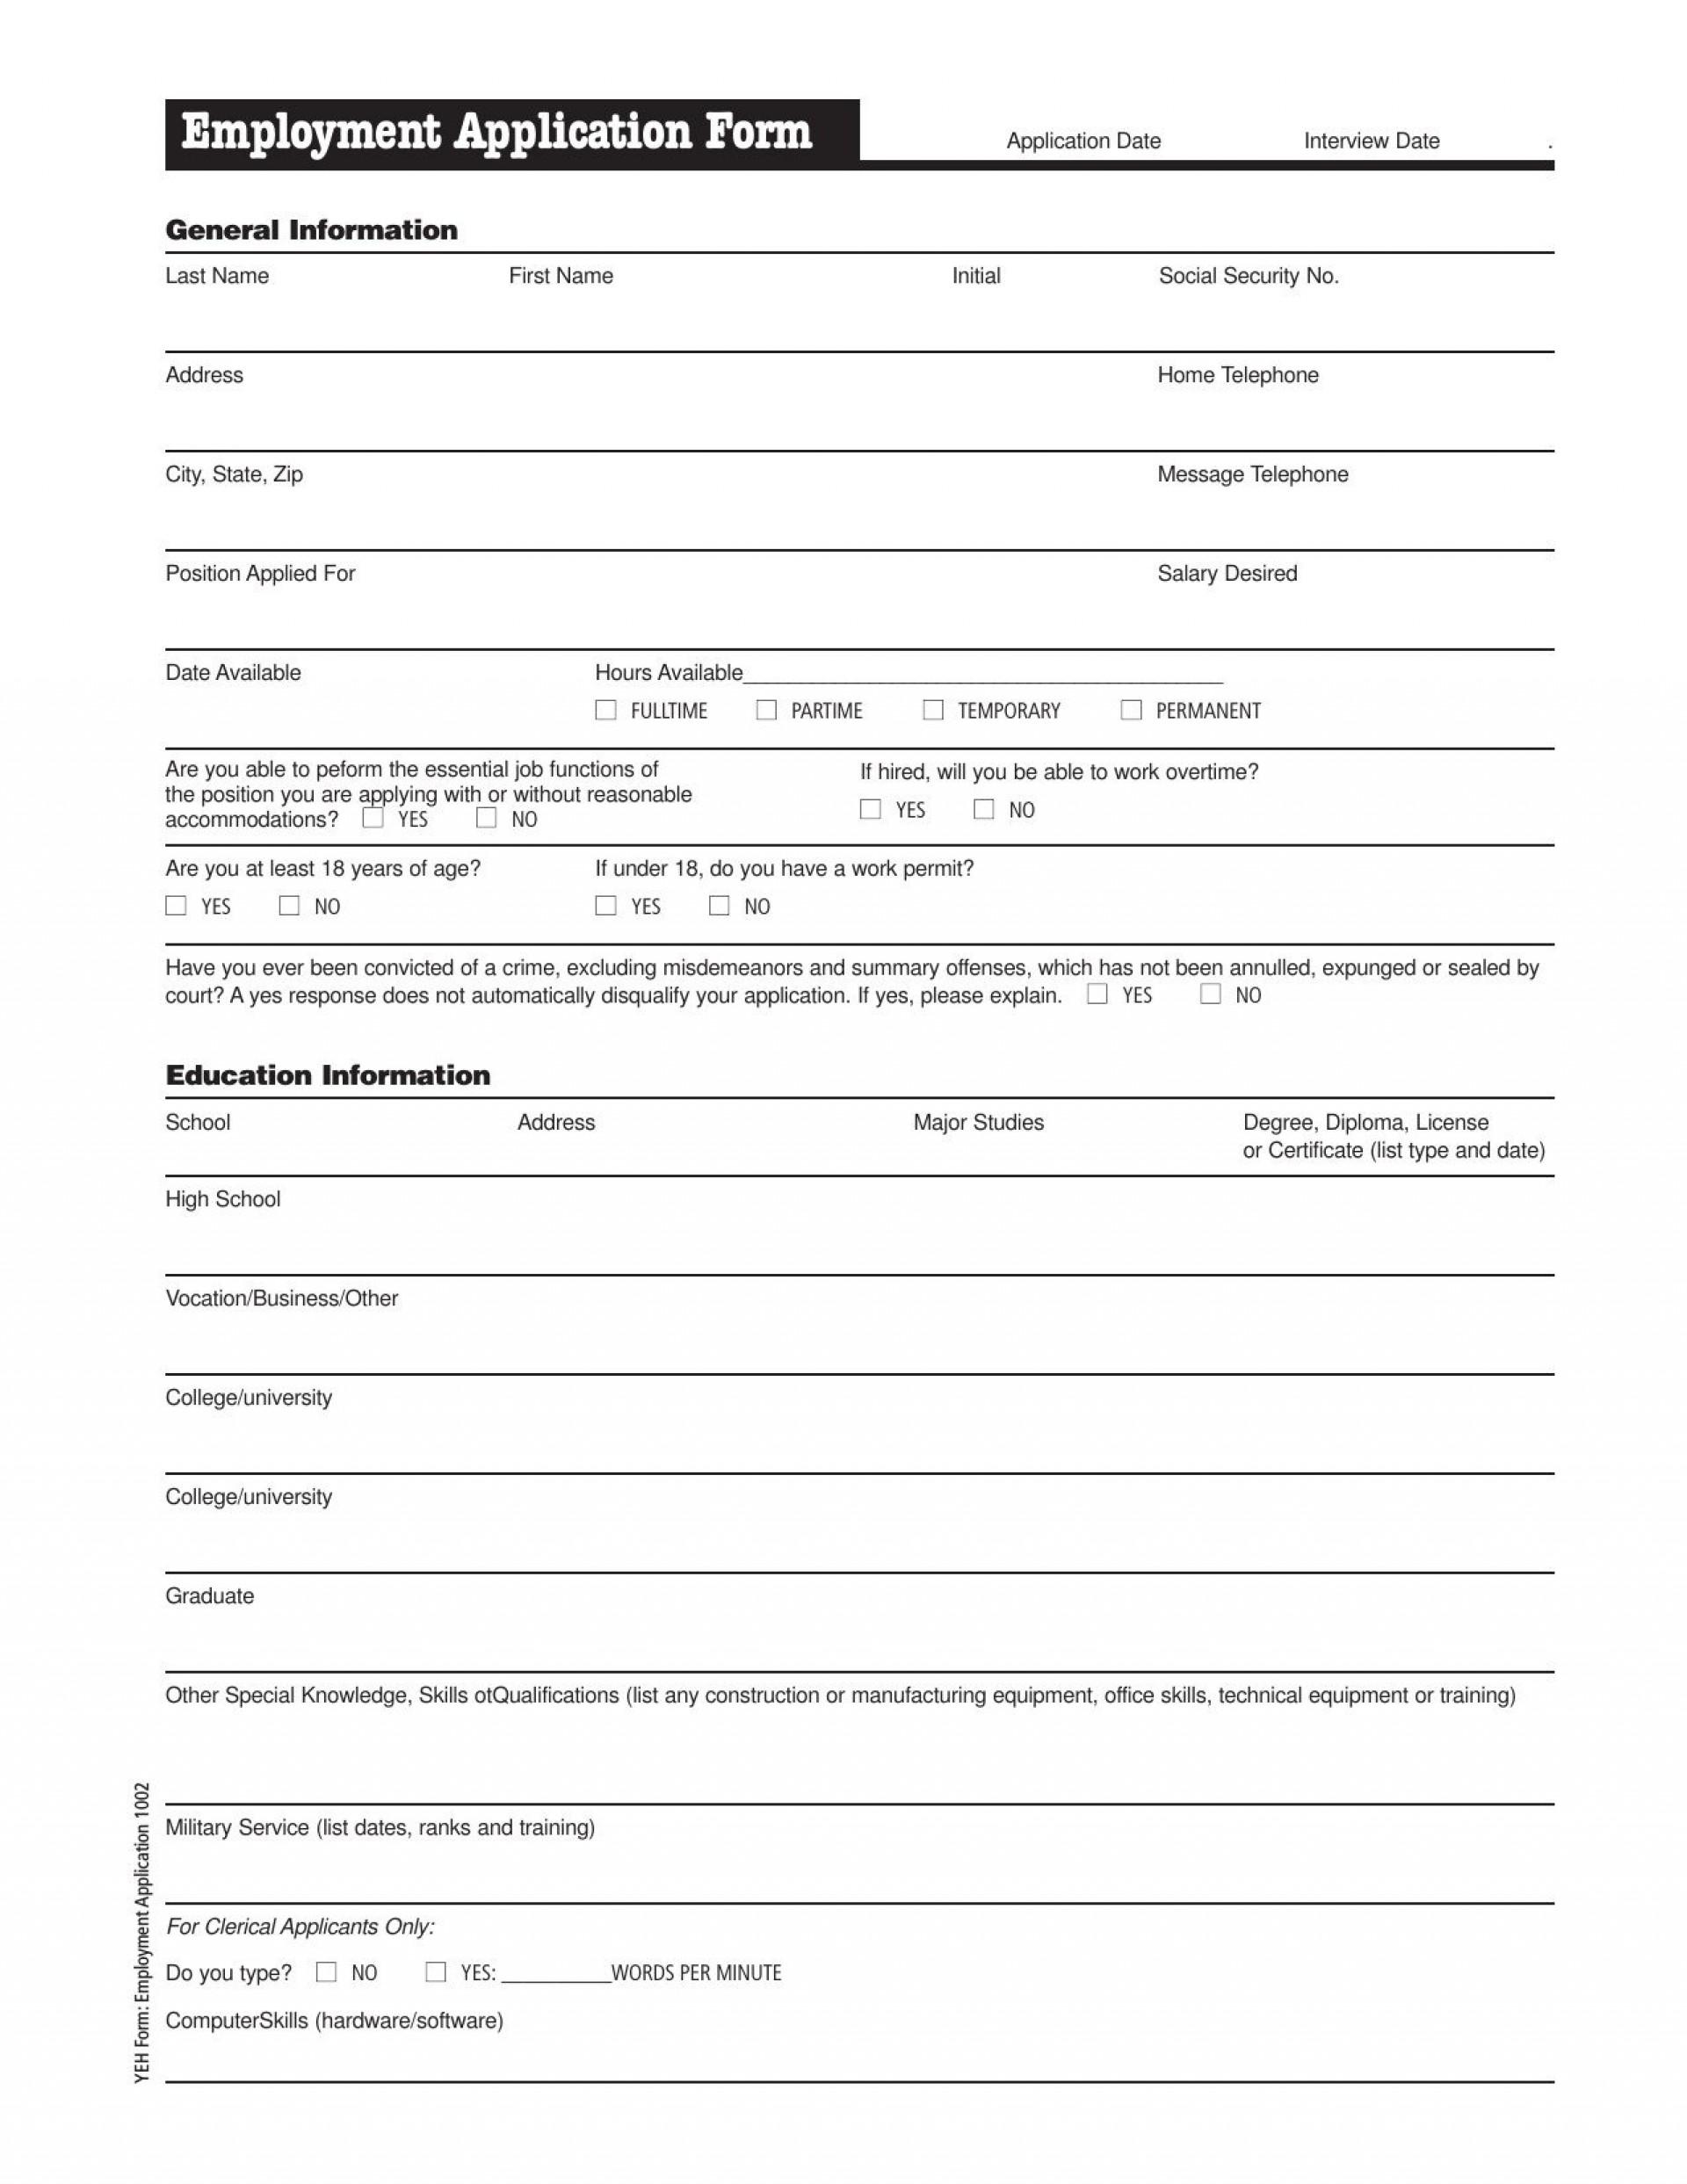 009 Excellent Job Application Template Pdf Design  Employment Form California Restaurant Sri Lanka1920